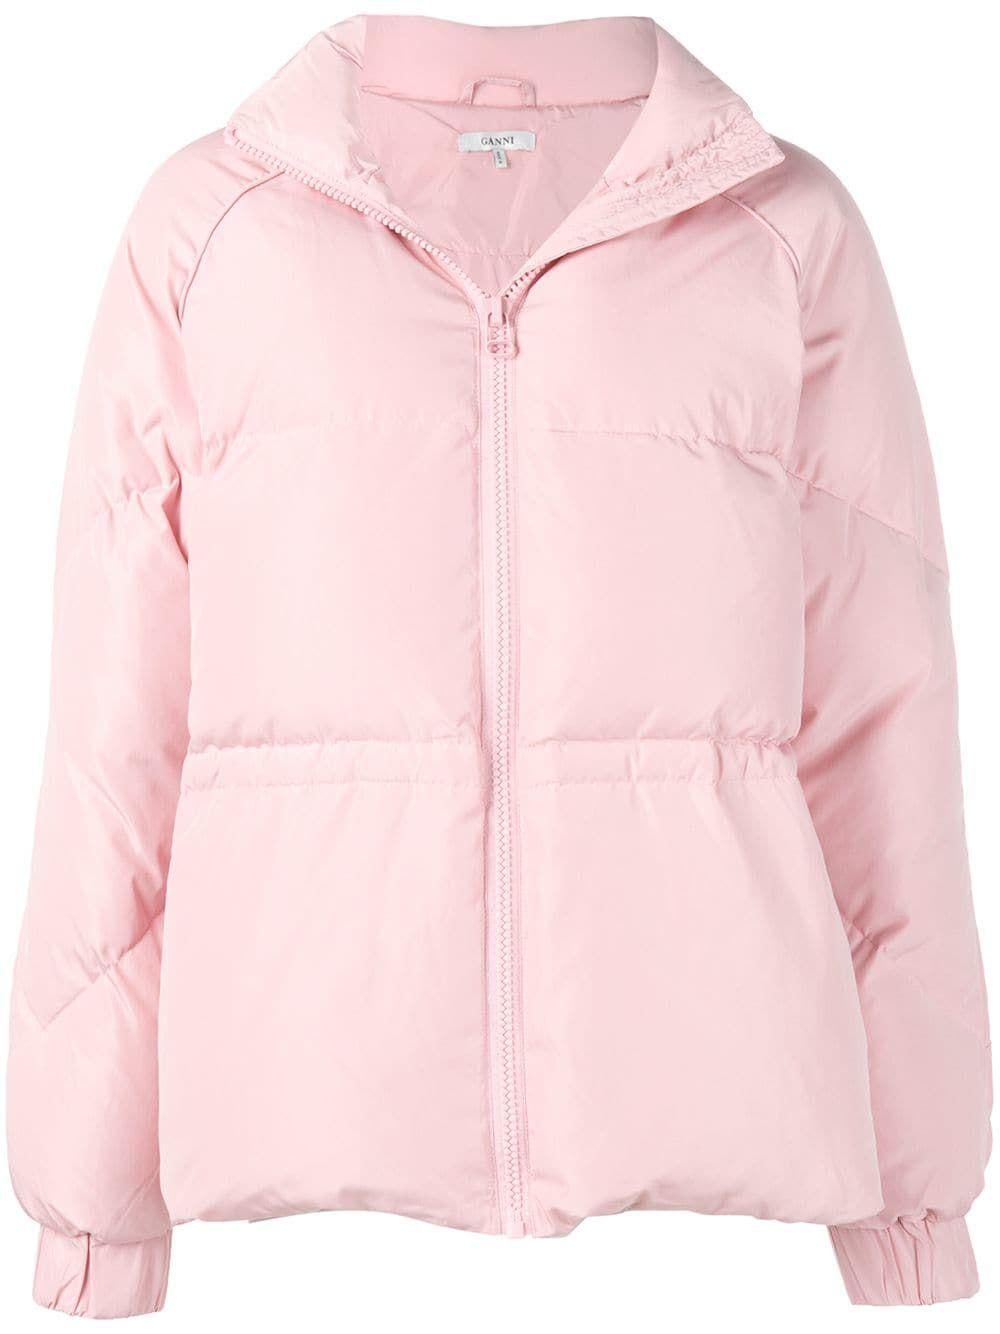 Ganni Tech Down Puffer Jacket Farfetch Puffer Jacket Women Puffer Jackets Jackets For Women [ 1334 x 1000 Pixel ]